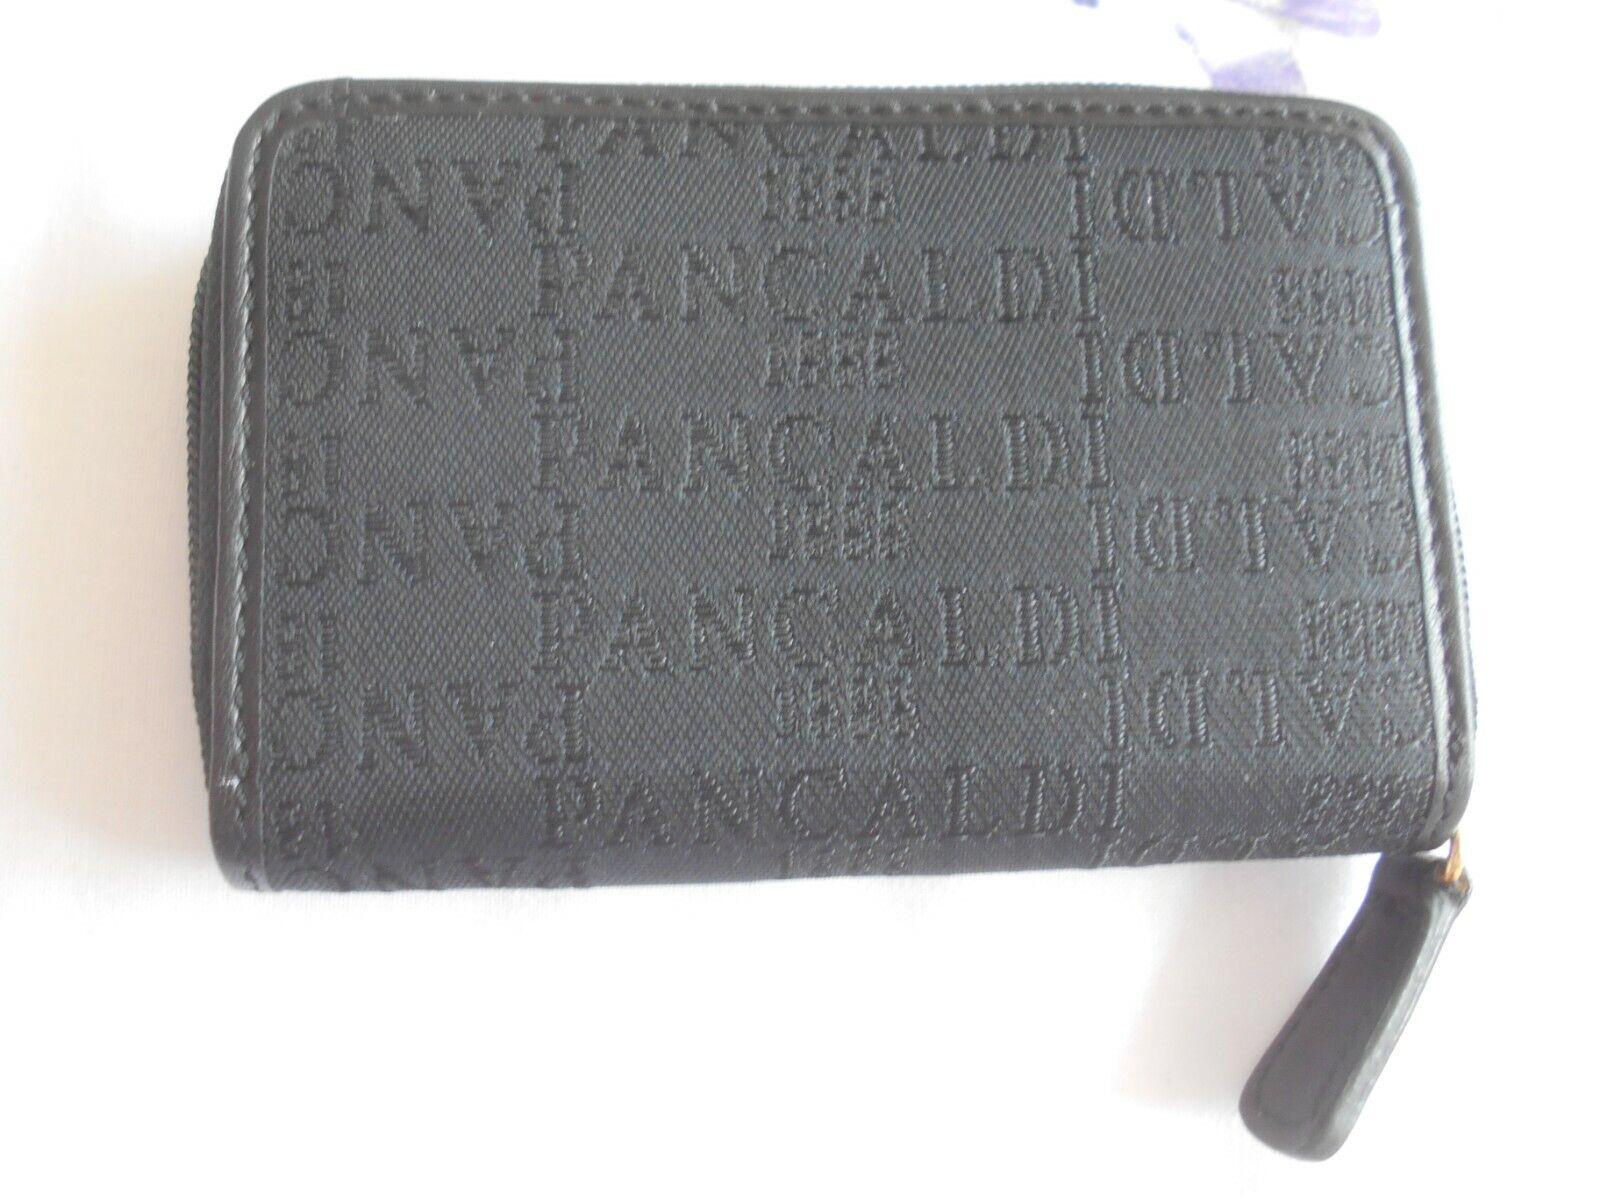 """PANCALDI"" ITALIAN DESIGNER BLACK LEATHER TRIMMED COIN PURSE VGC!!!"